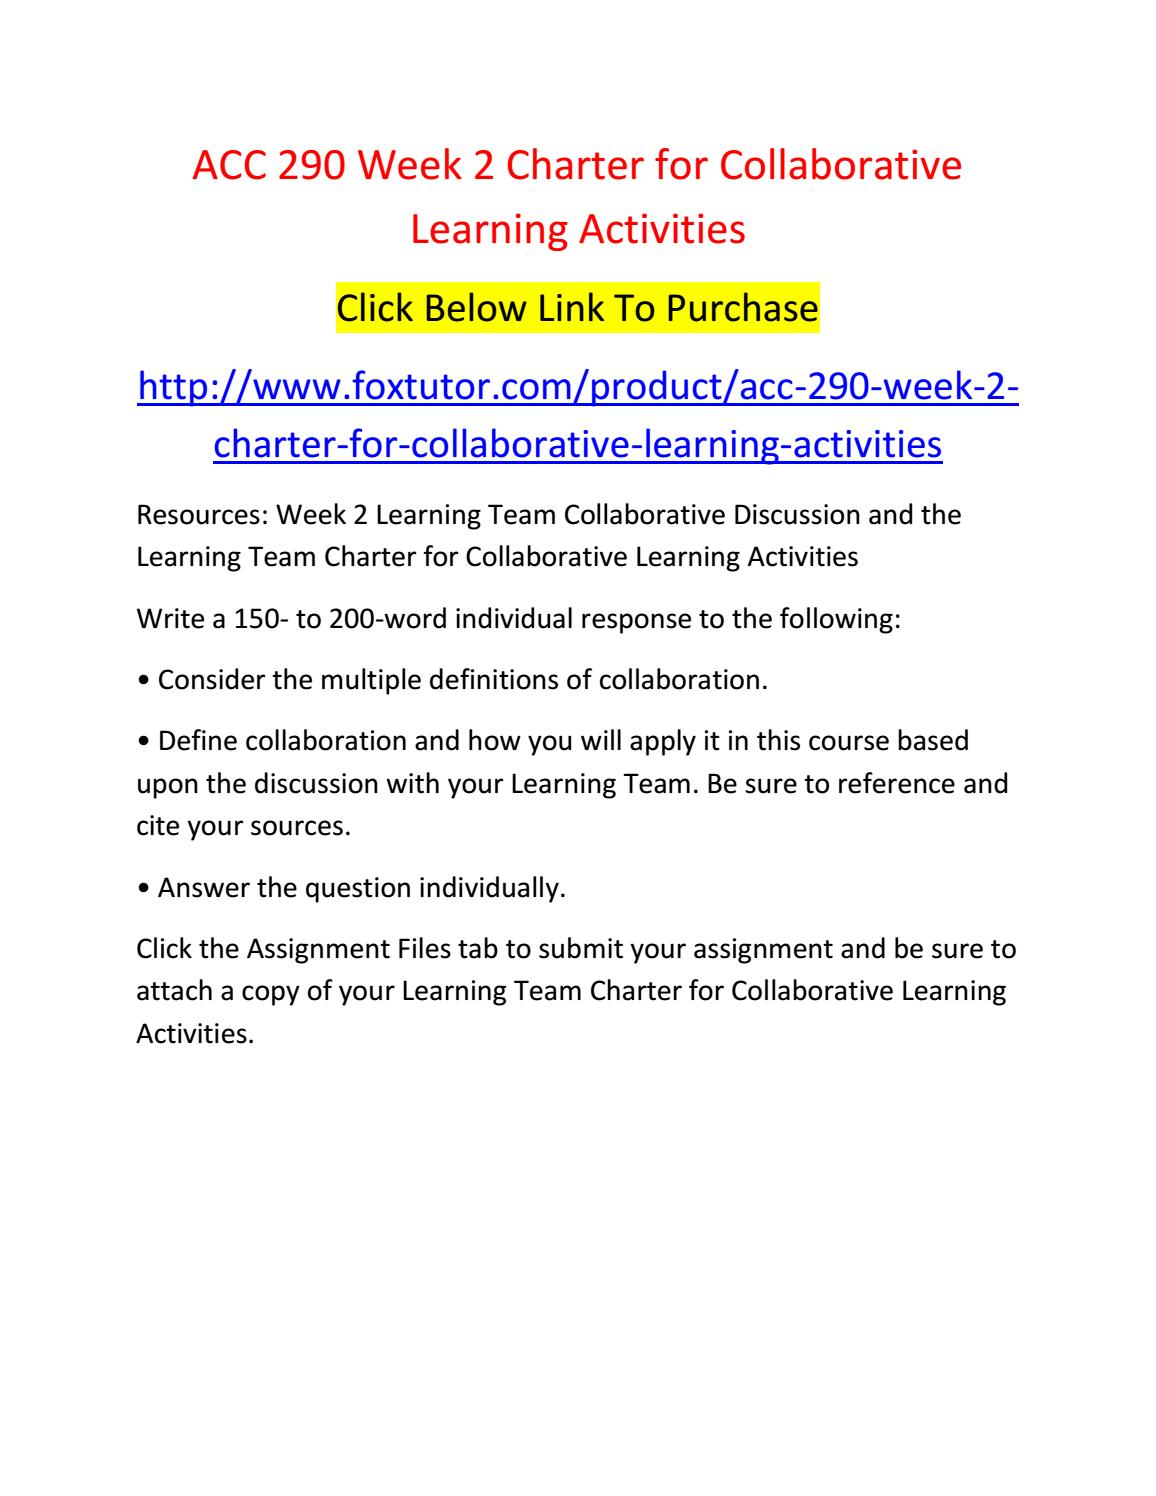 acc 290 Acc 290 week 4 wiley plus assignment week four 1 problem 4-8alinda blye opened cardinal window washing inc on july 1, 2010.